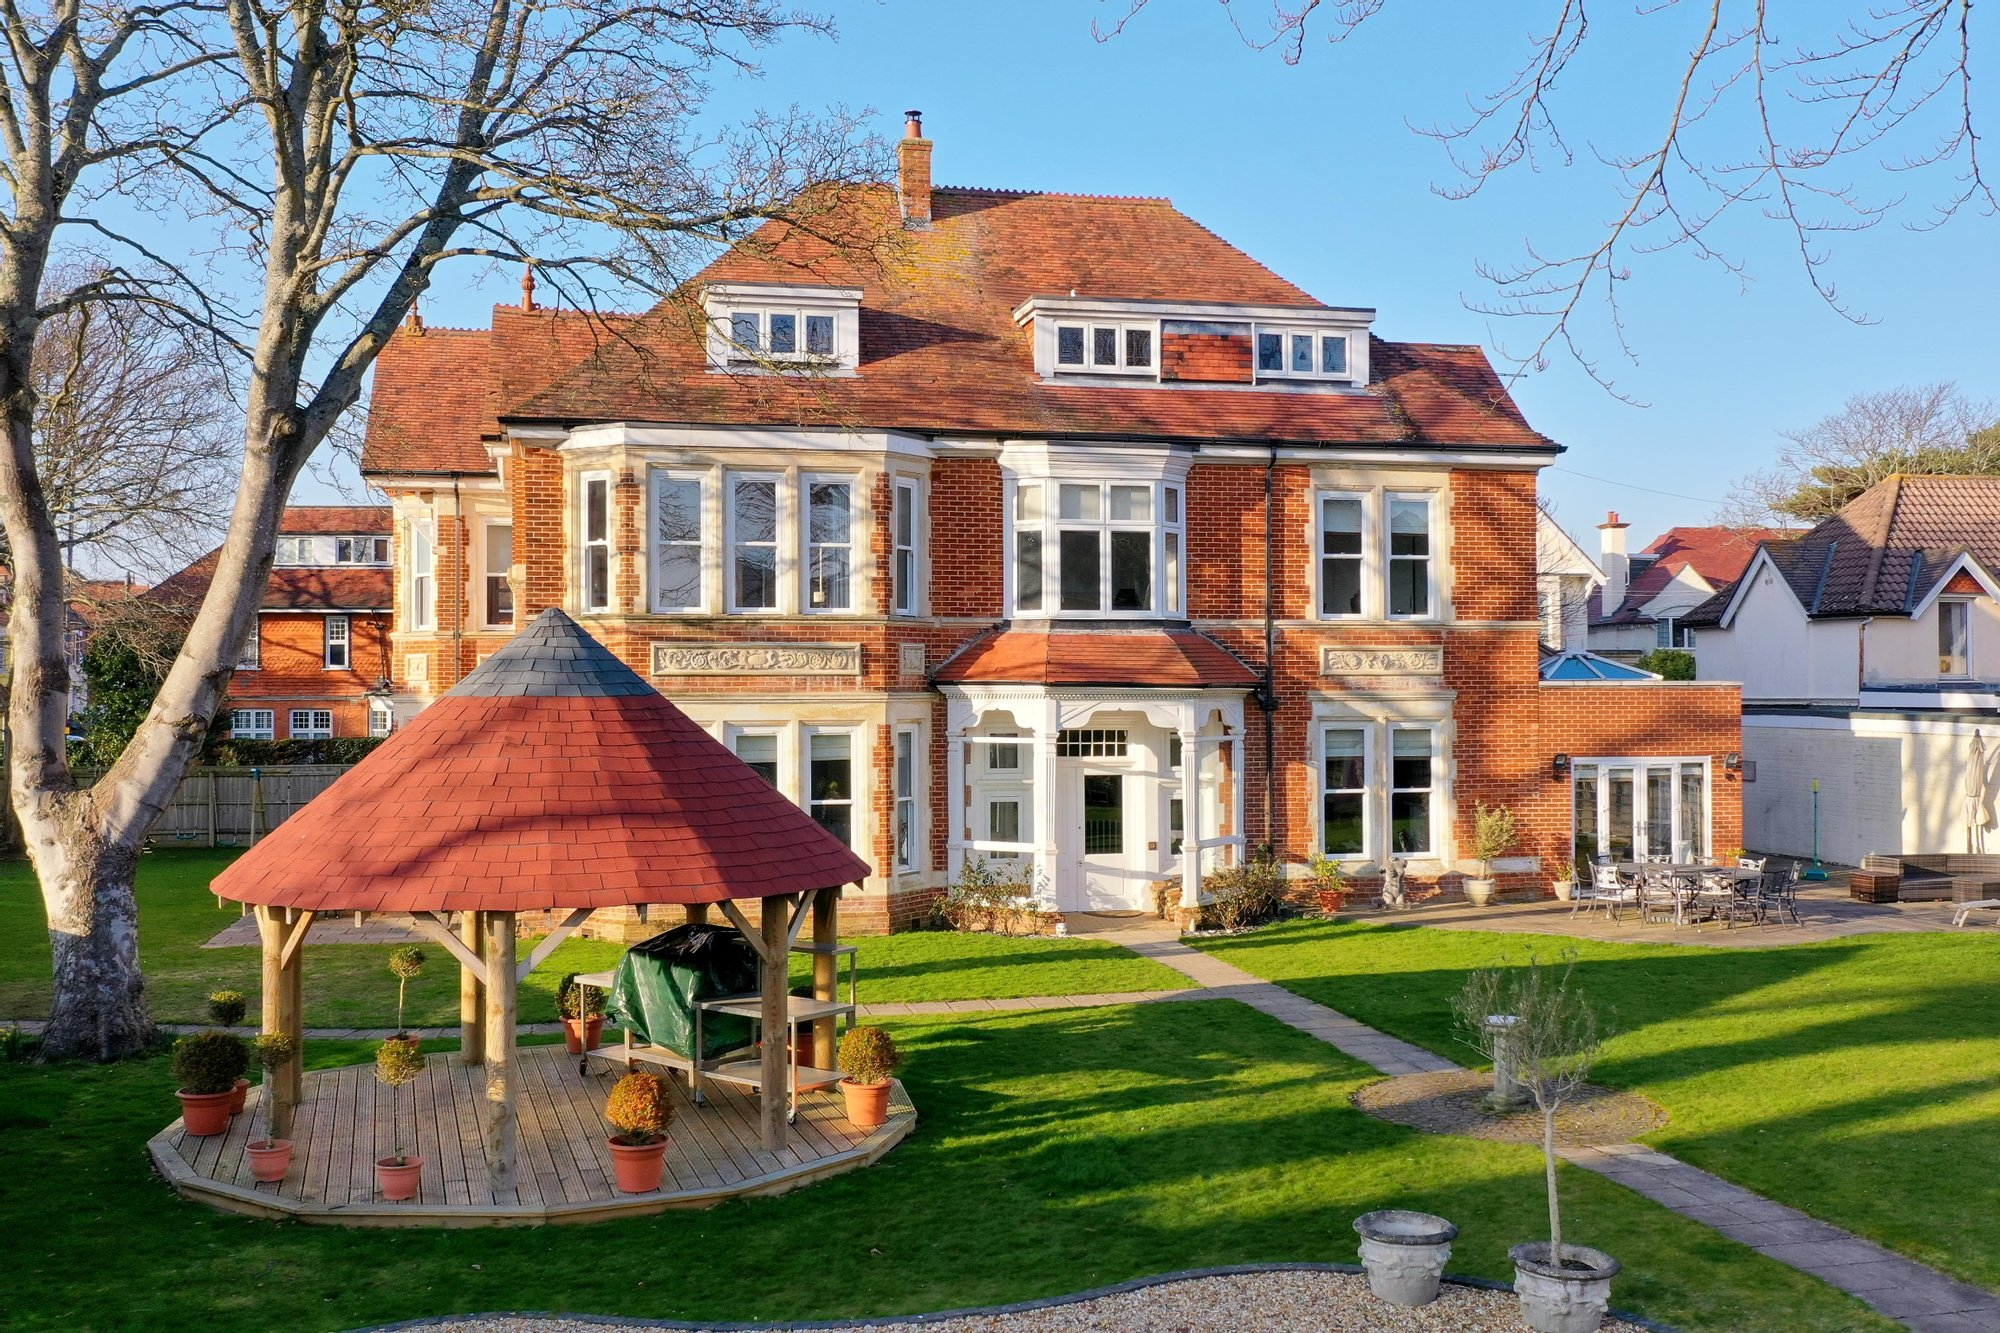 House in Boscombe, England, United Kingdom 1